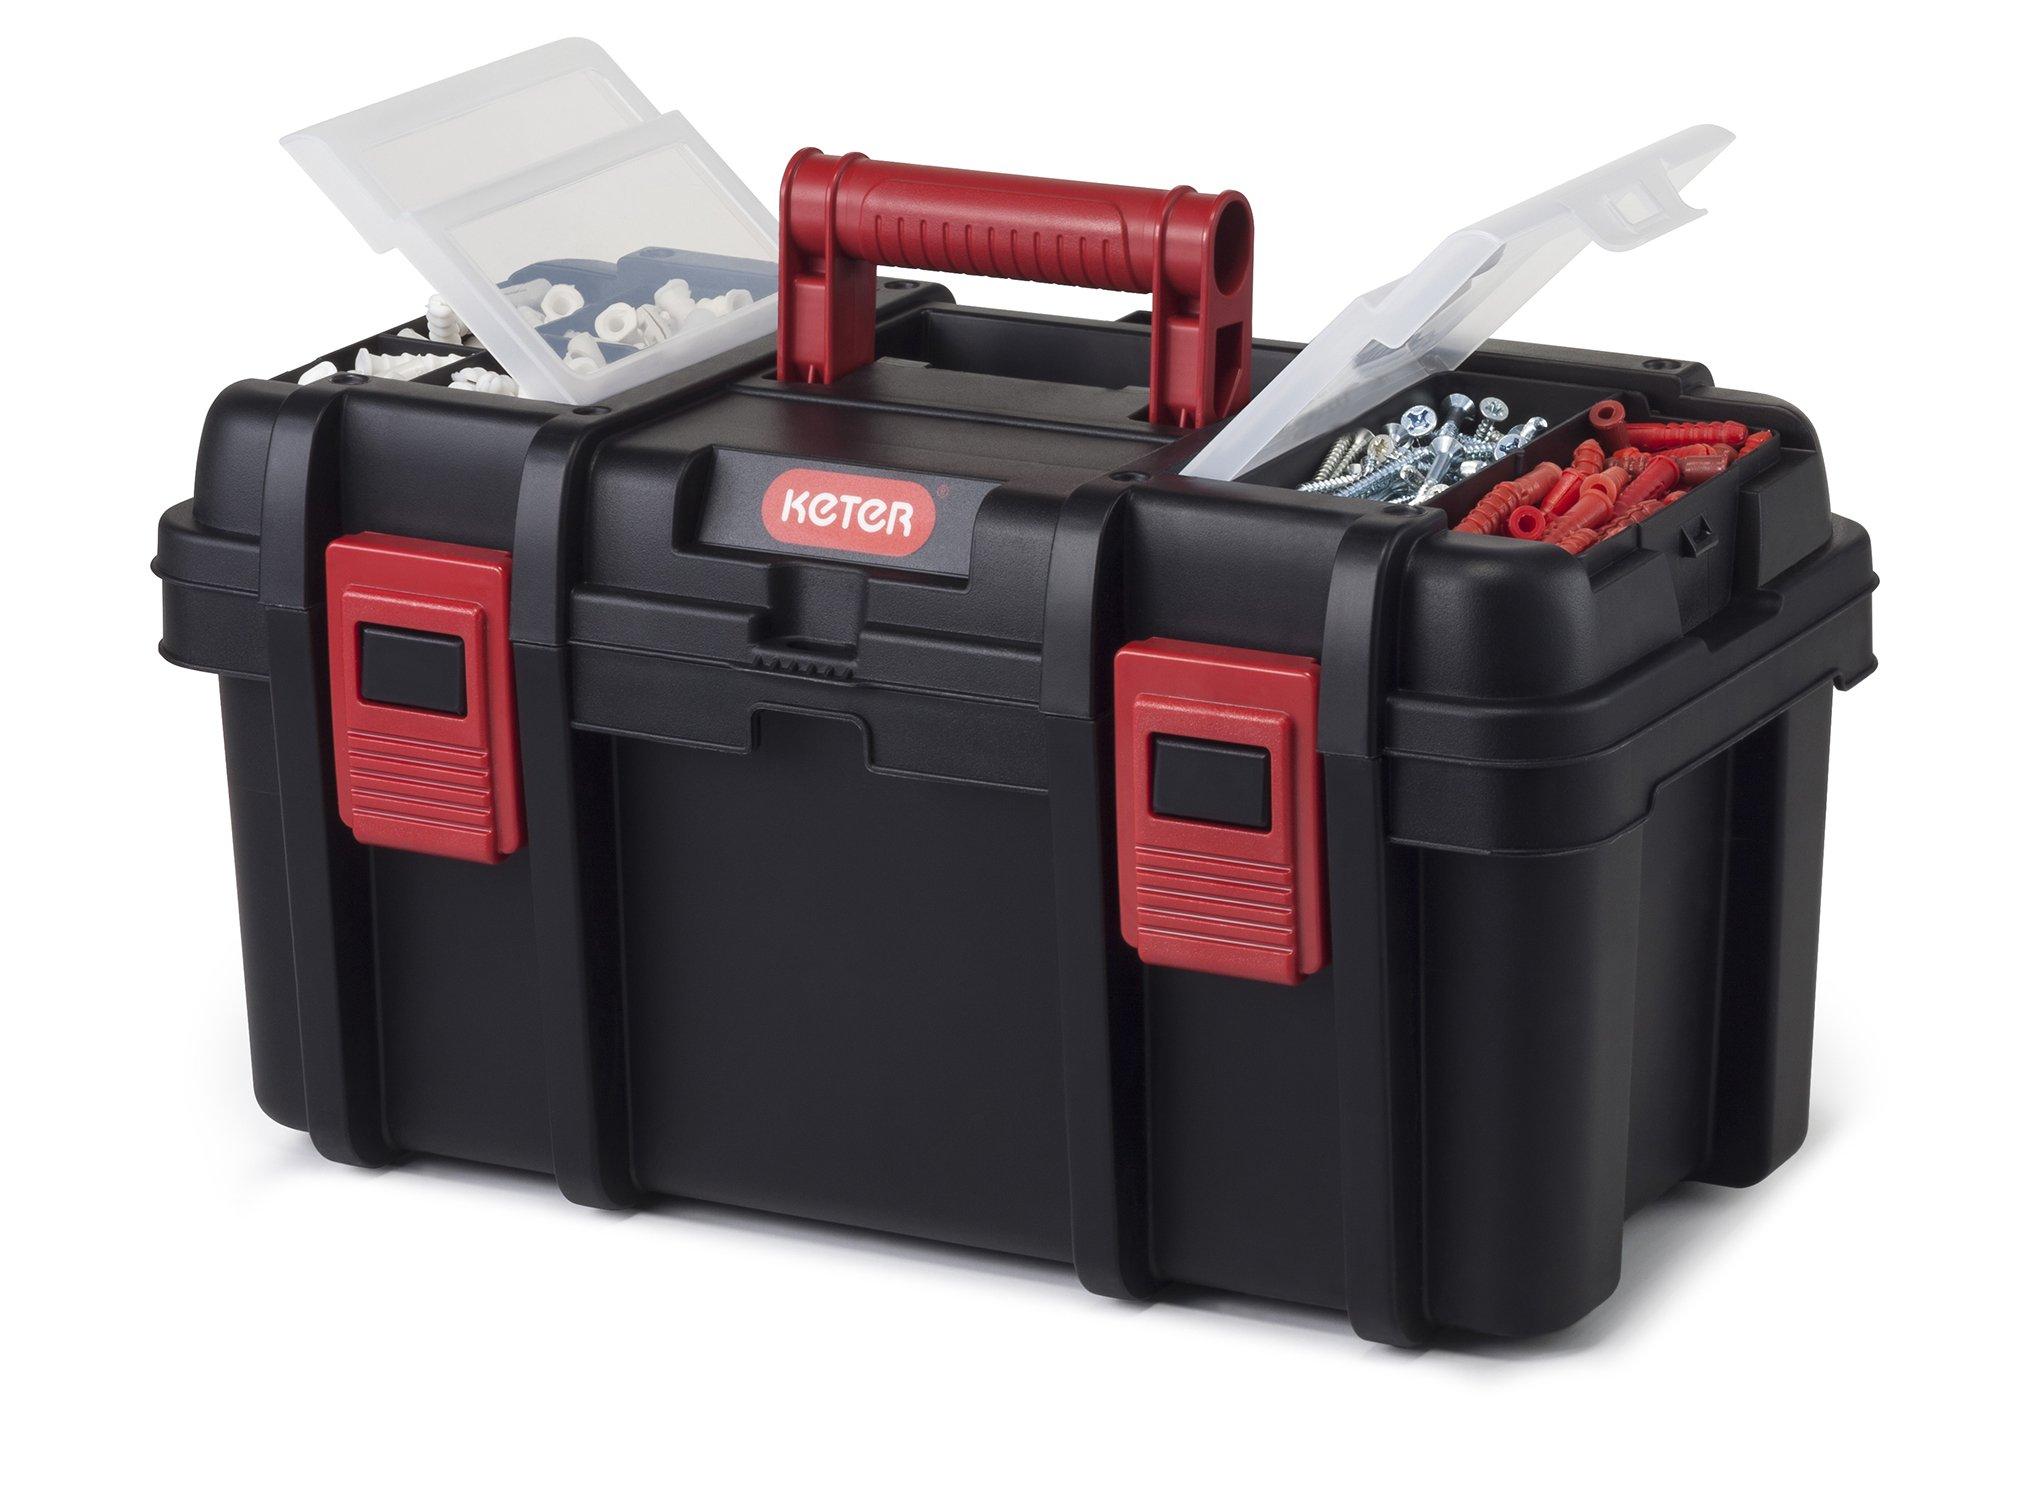 Keter Classic Tool Box 19'' Plastic Portable Organizer Tool Box Storage Solution